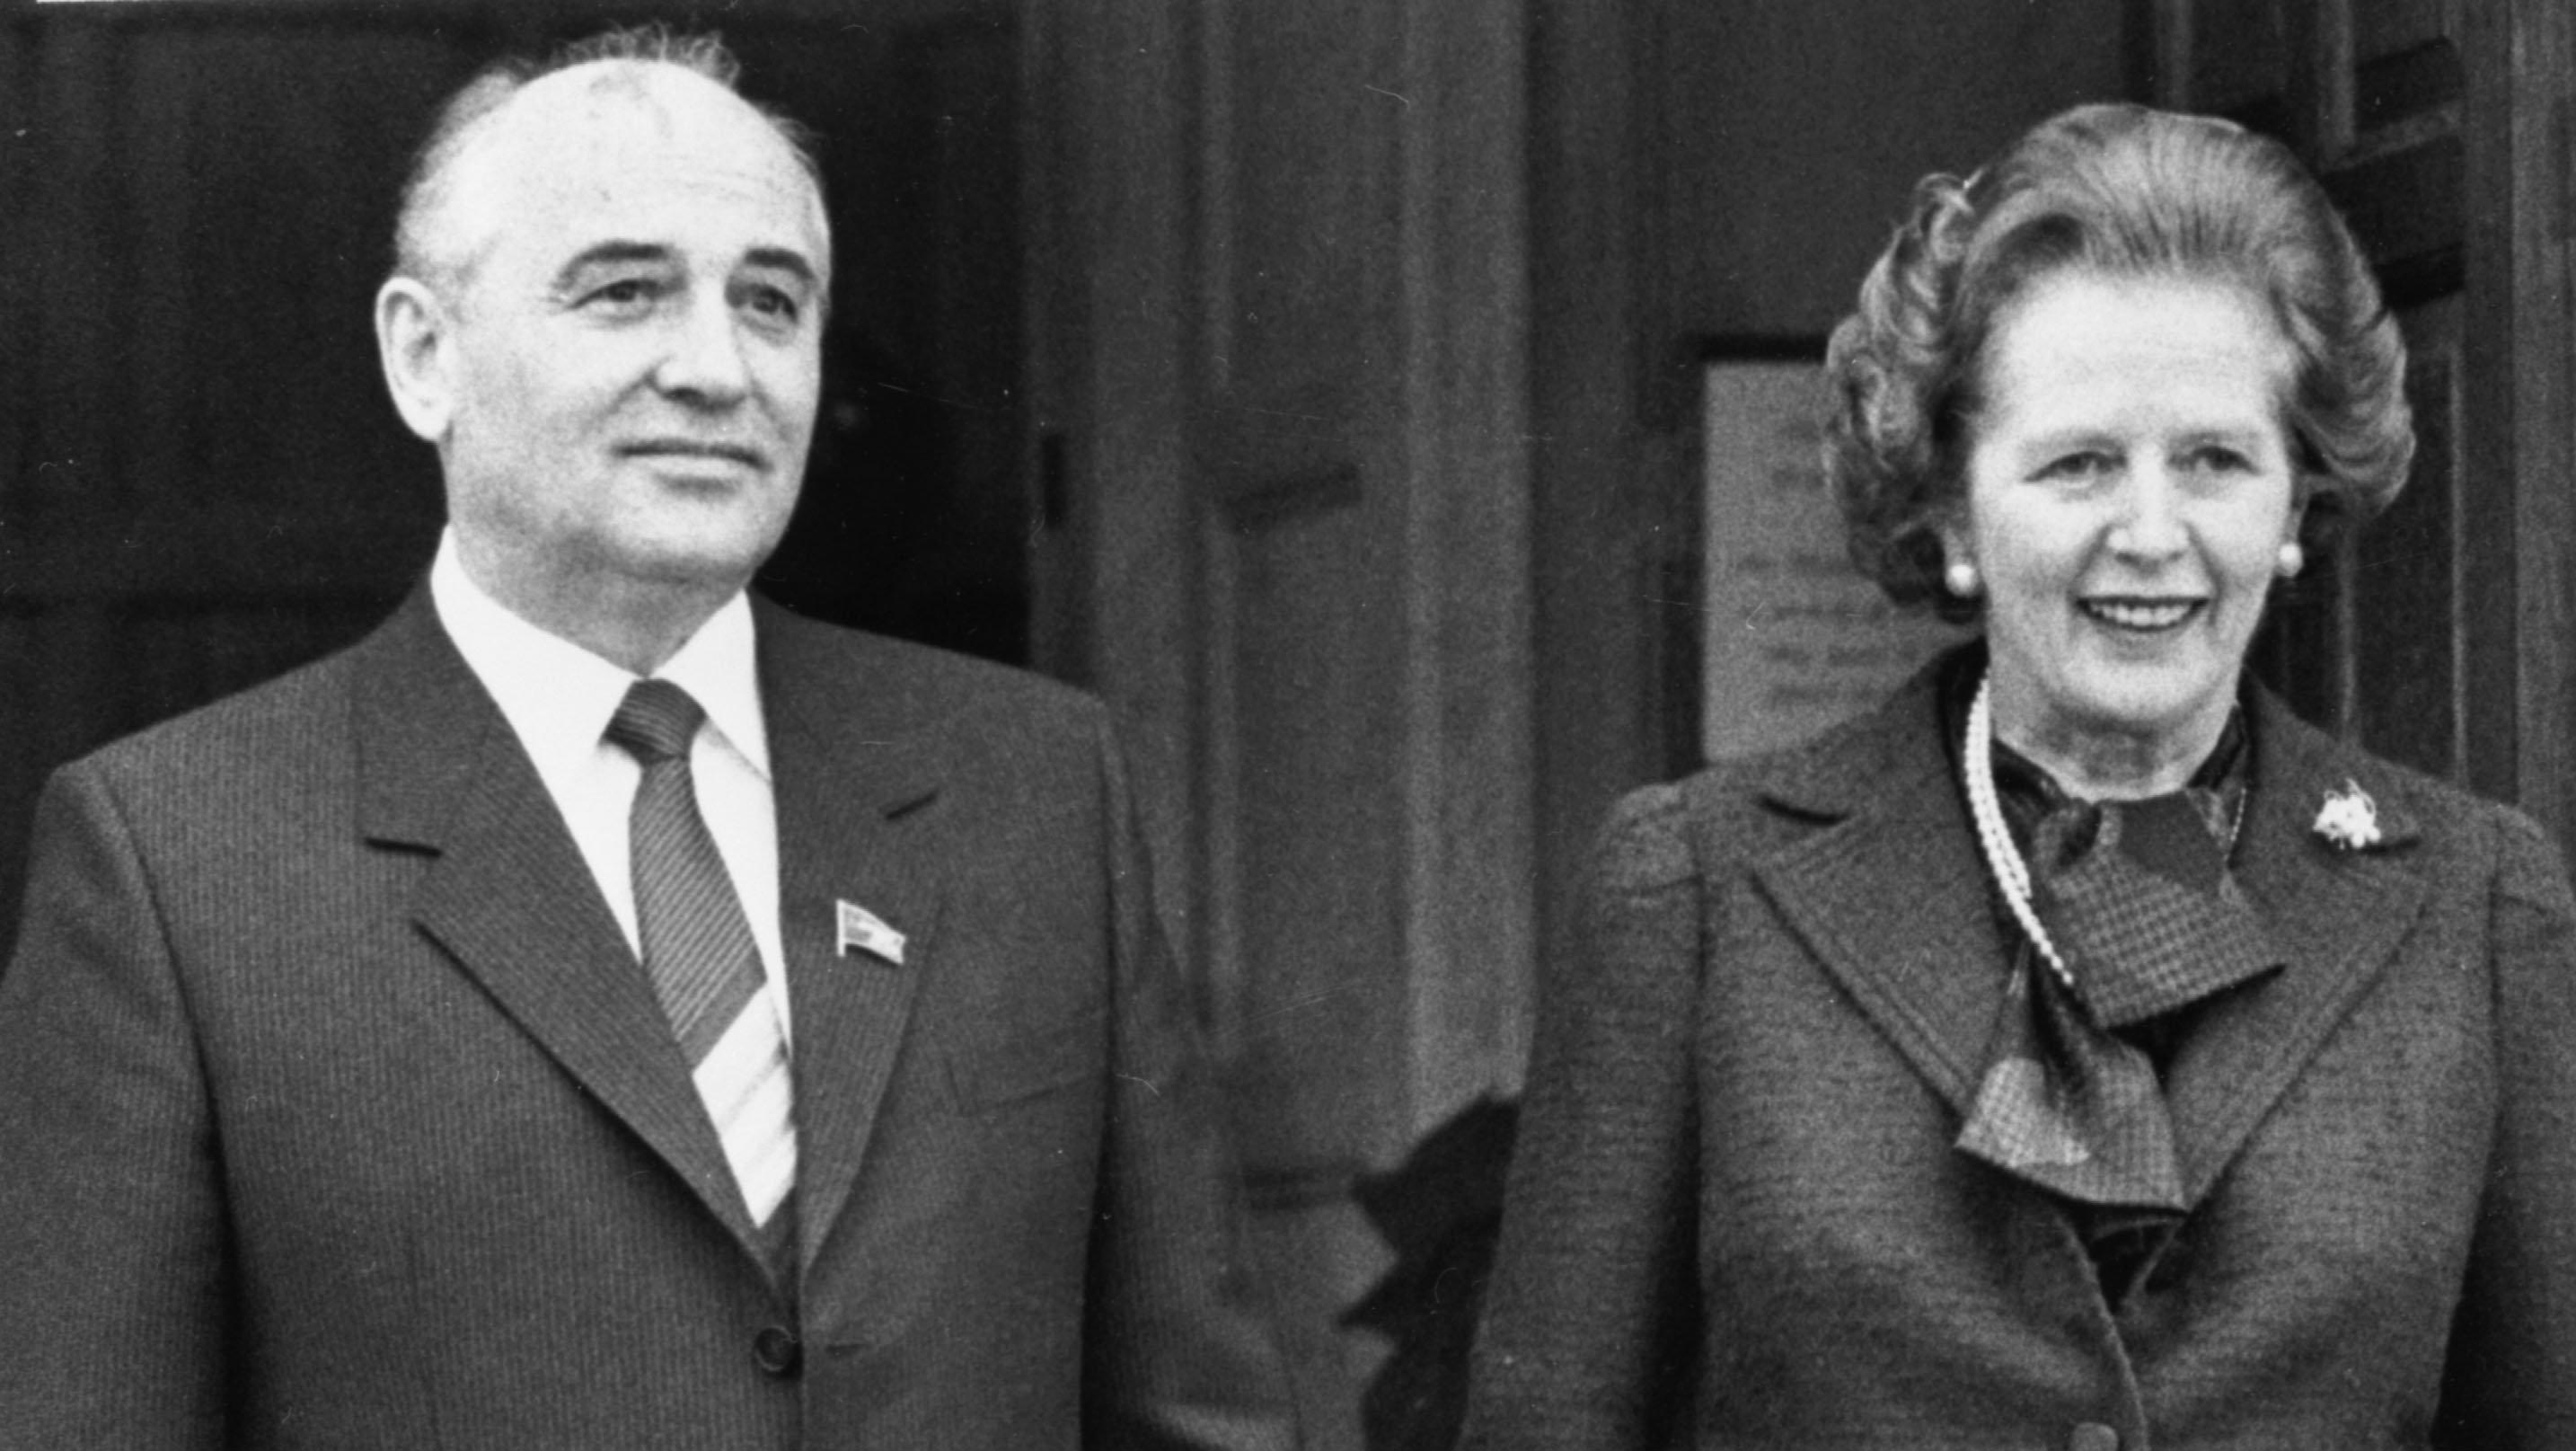 Former British Prime Minister Margaret Thatcher and Soviet leader-to-be Mikhail Gorbachev in 1984